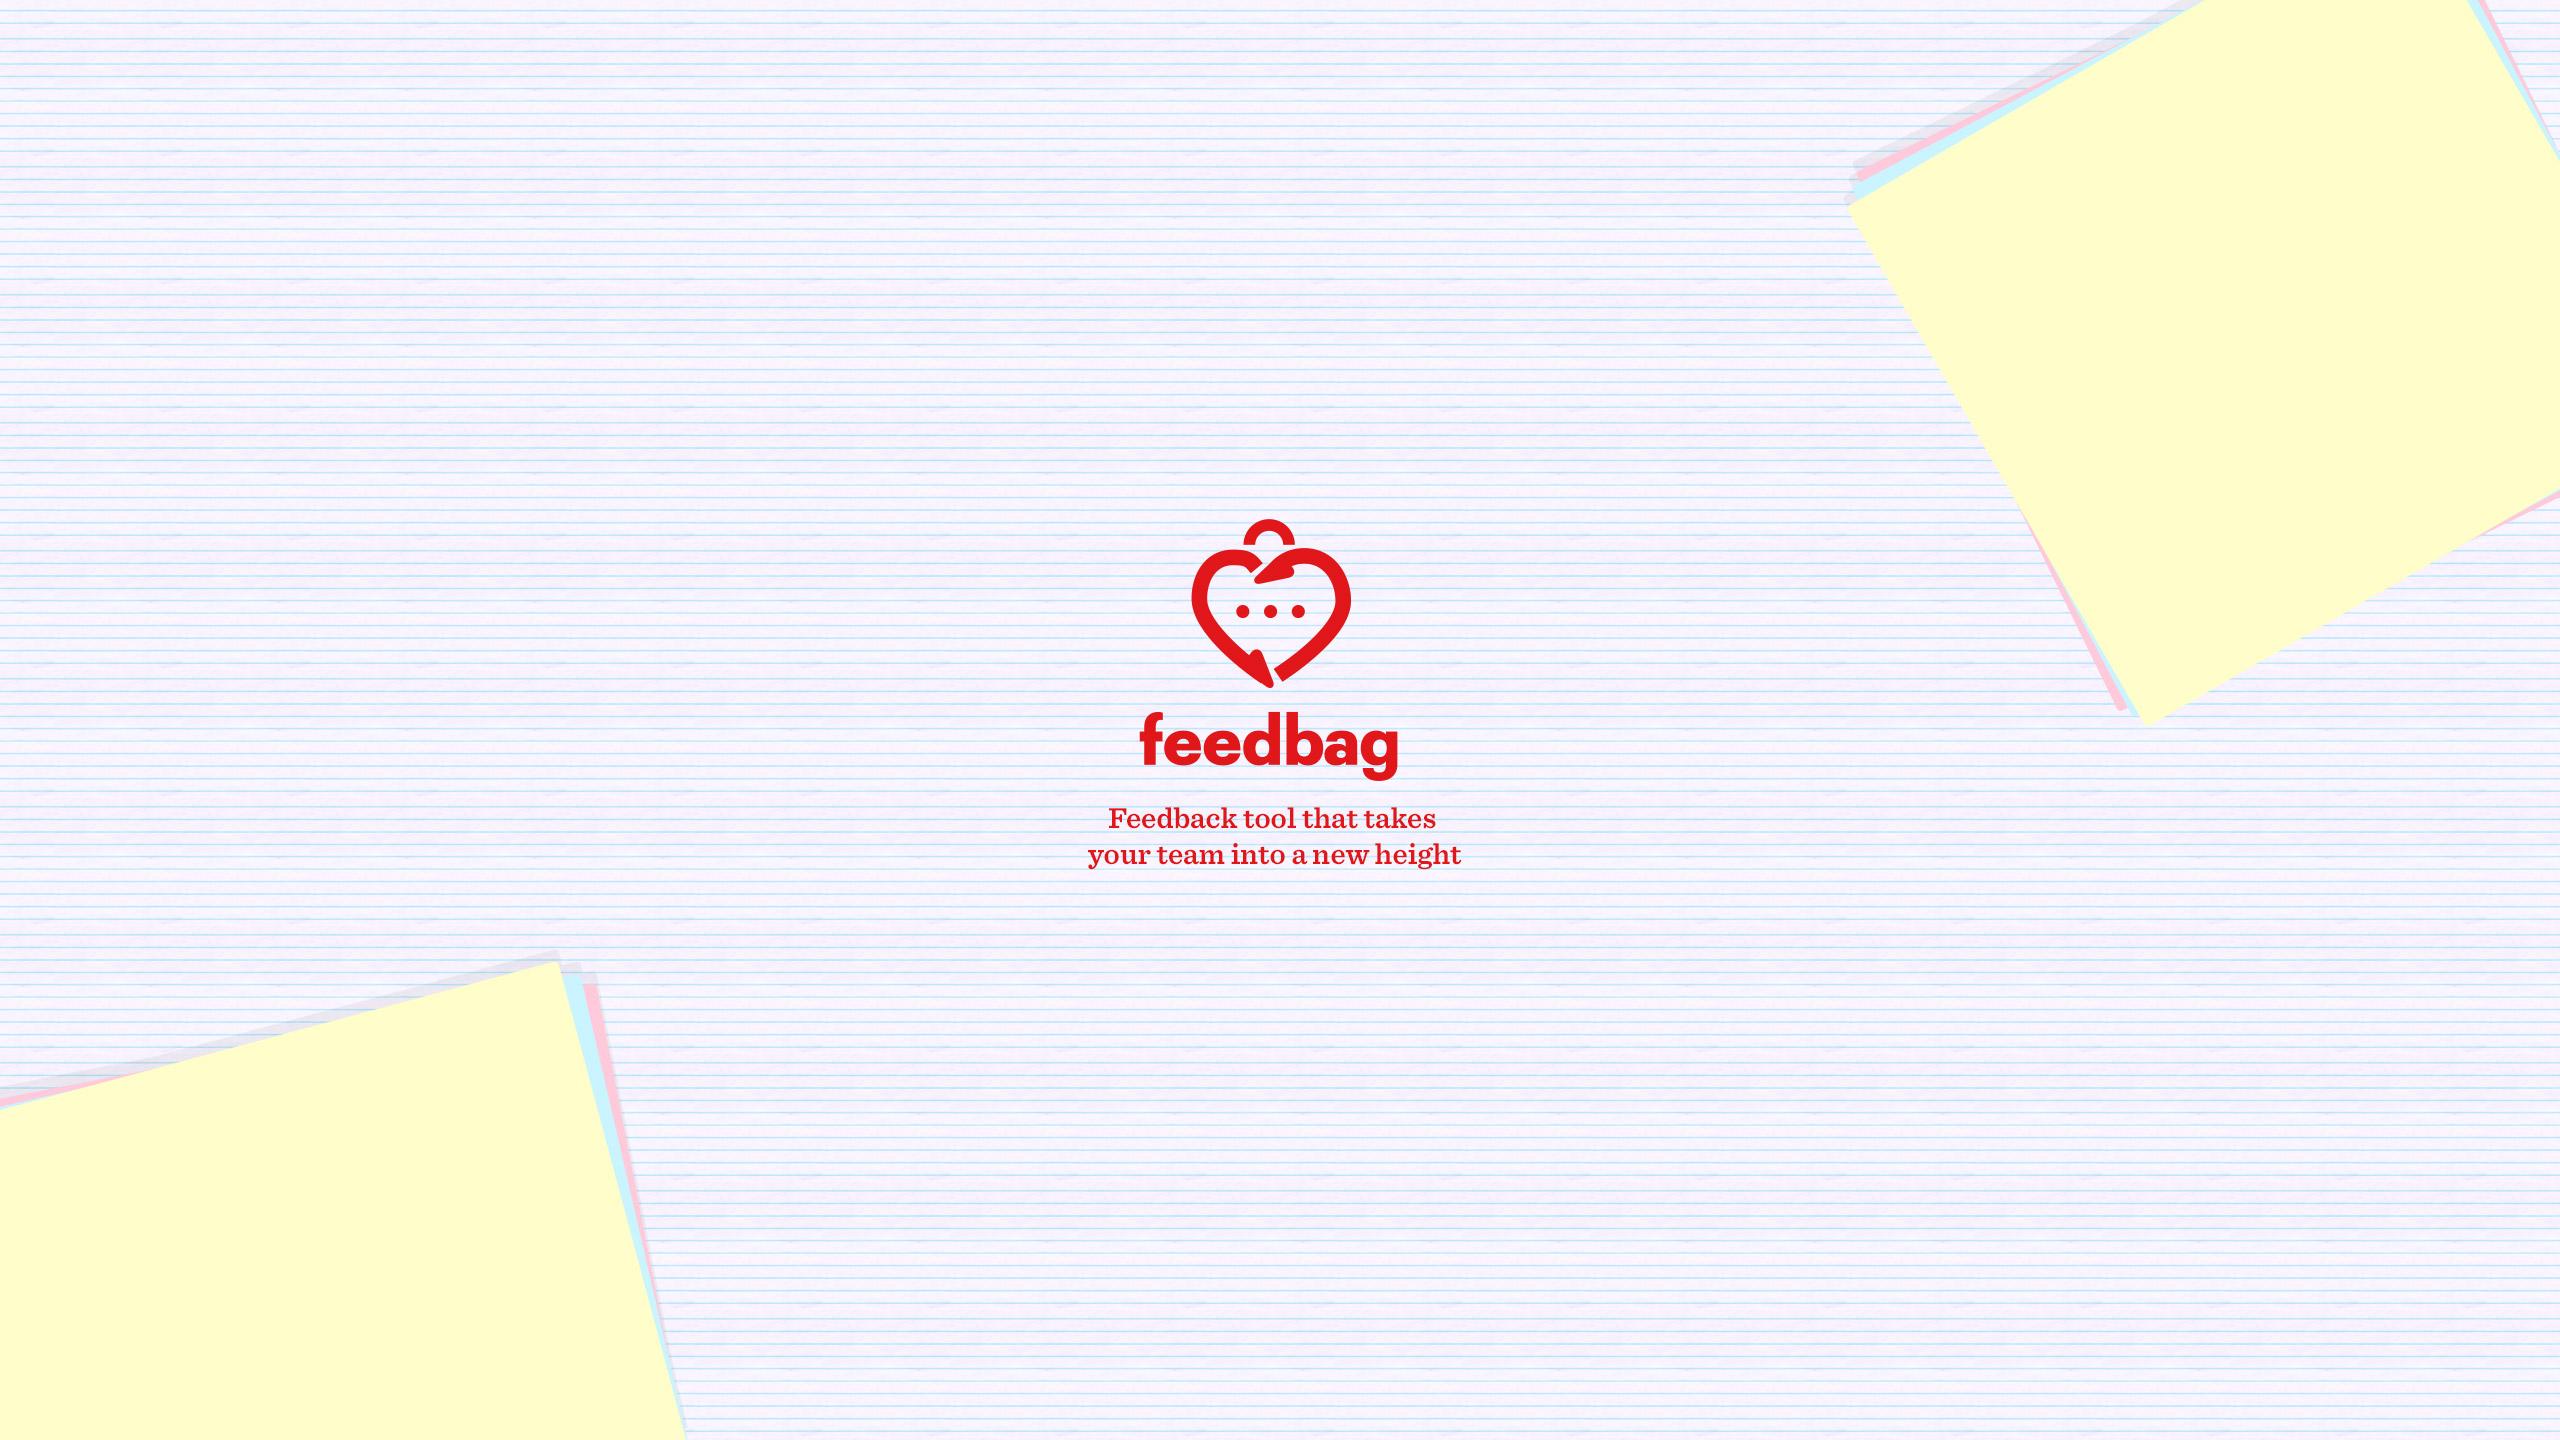 Feedbag_Cover